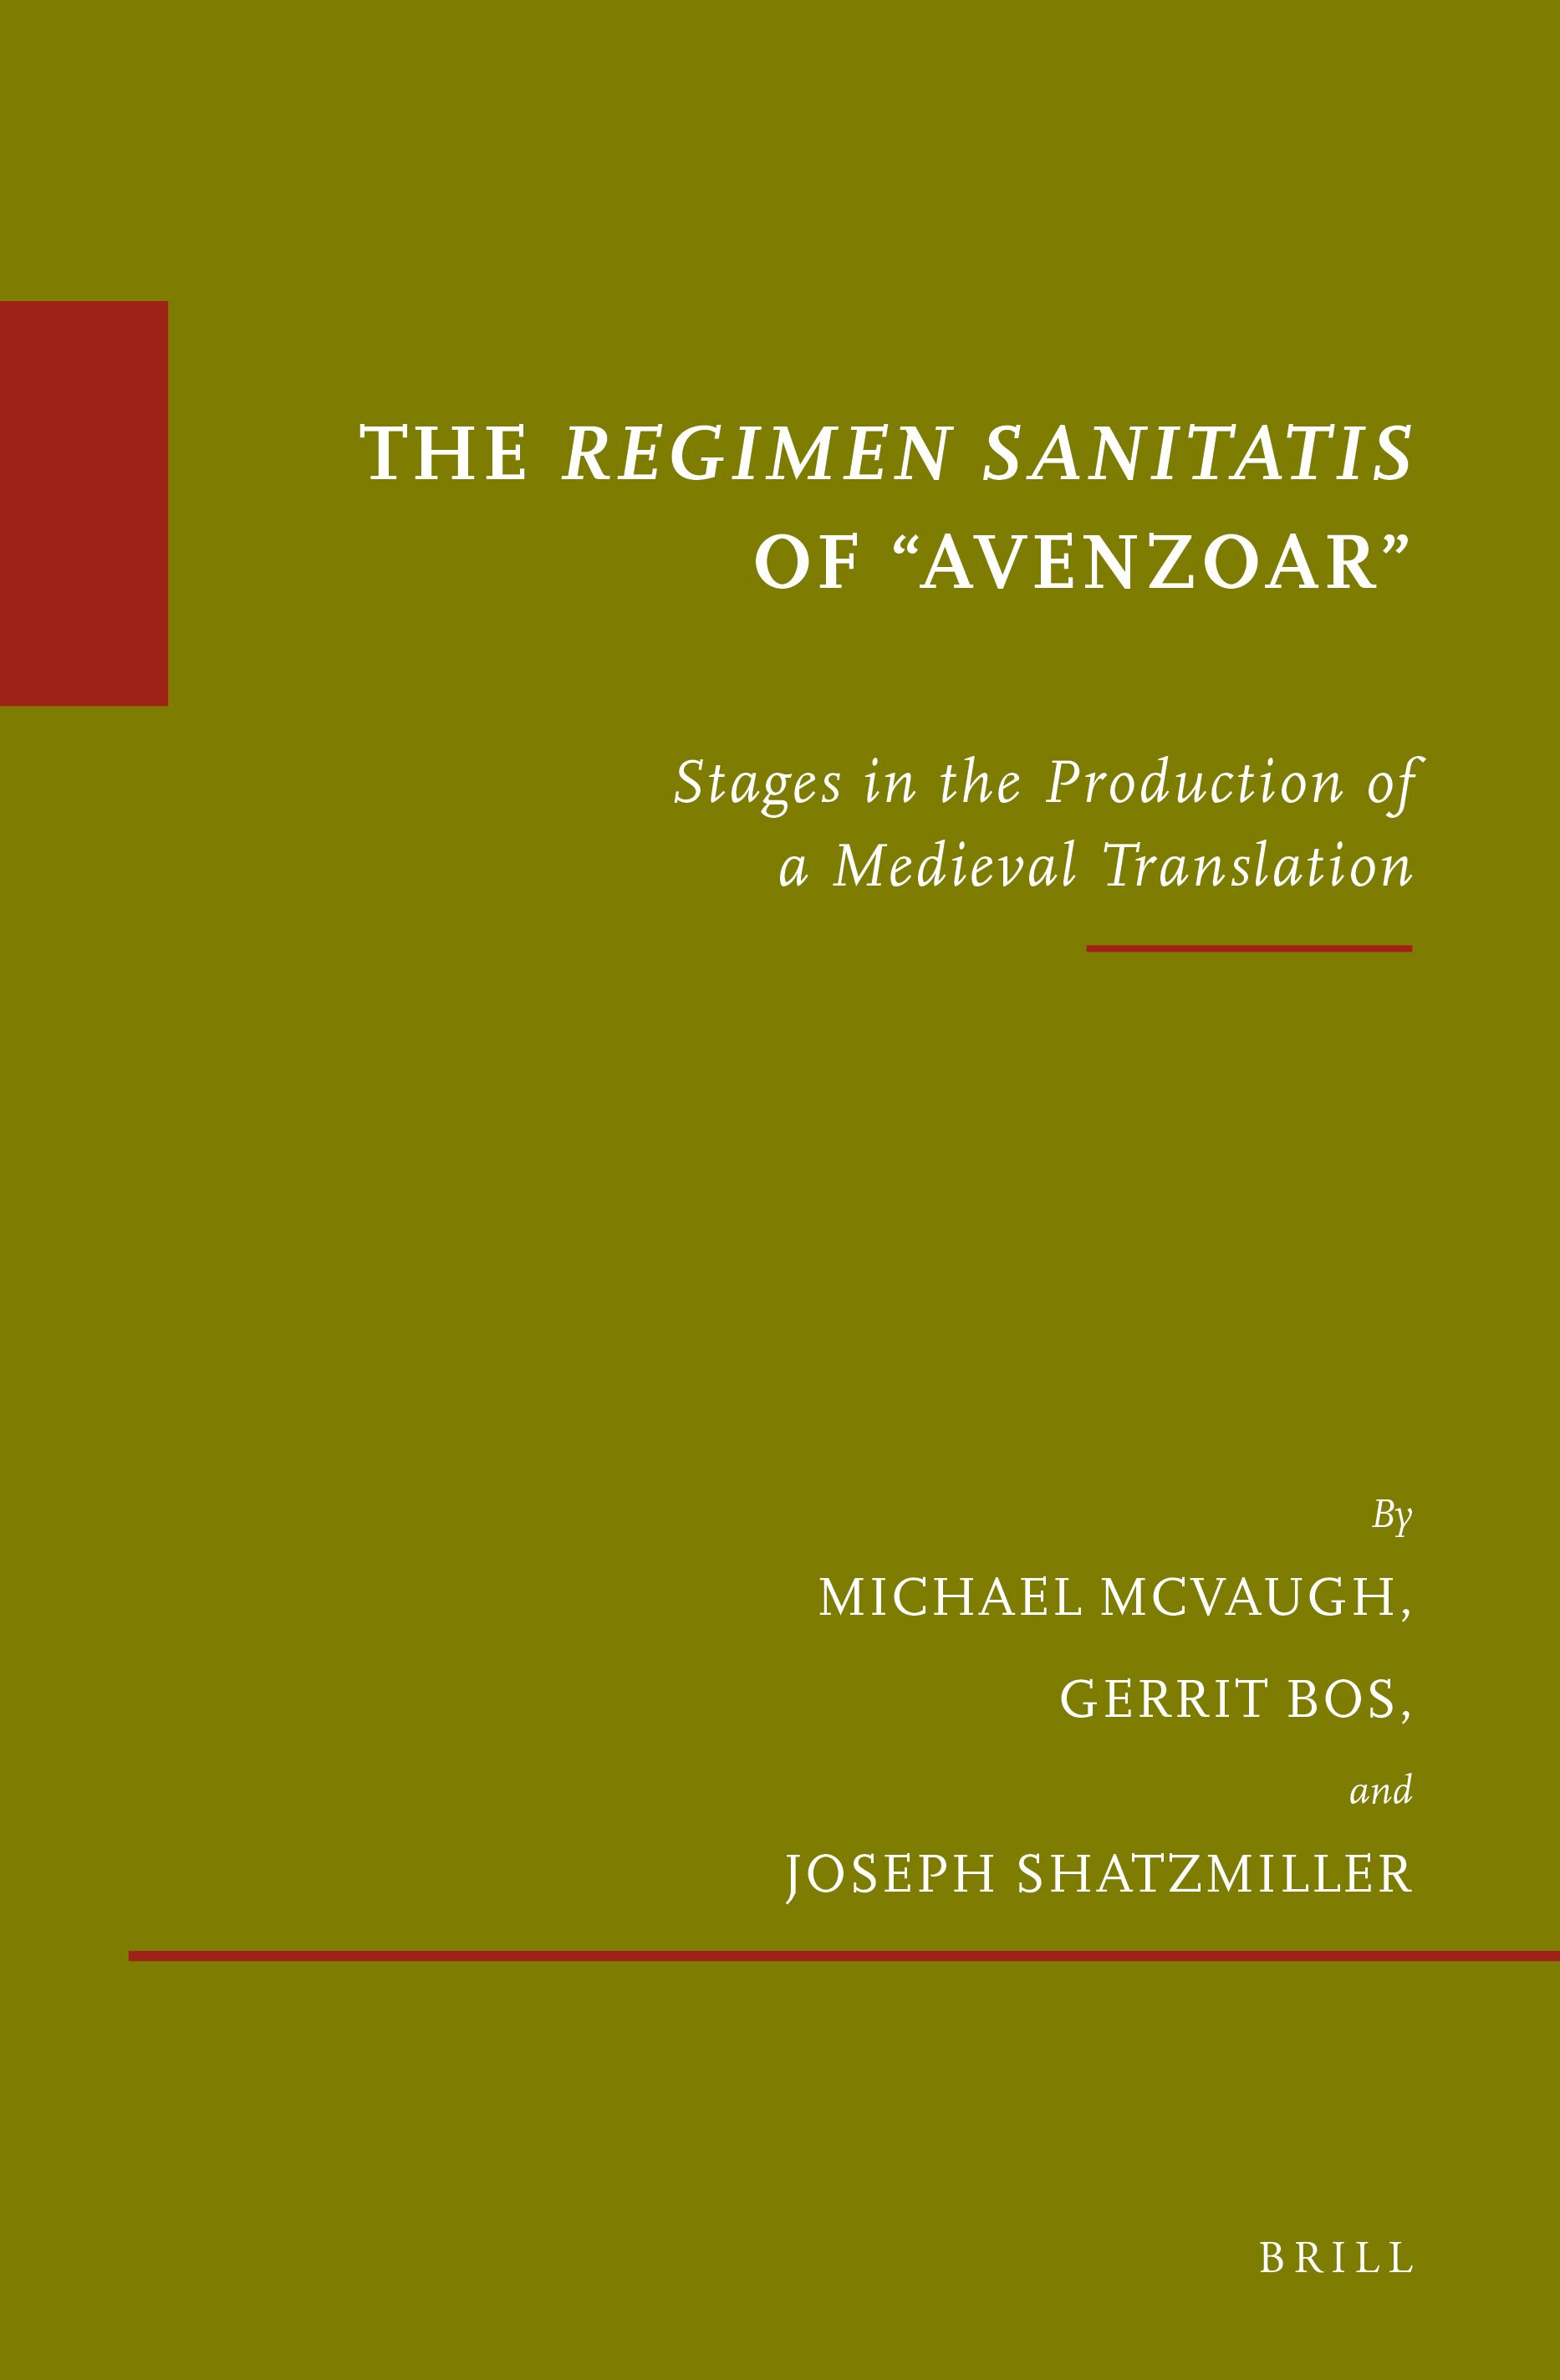 Historical Introduction In The Ltigtregimen